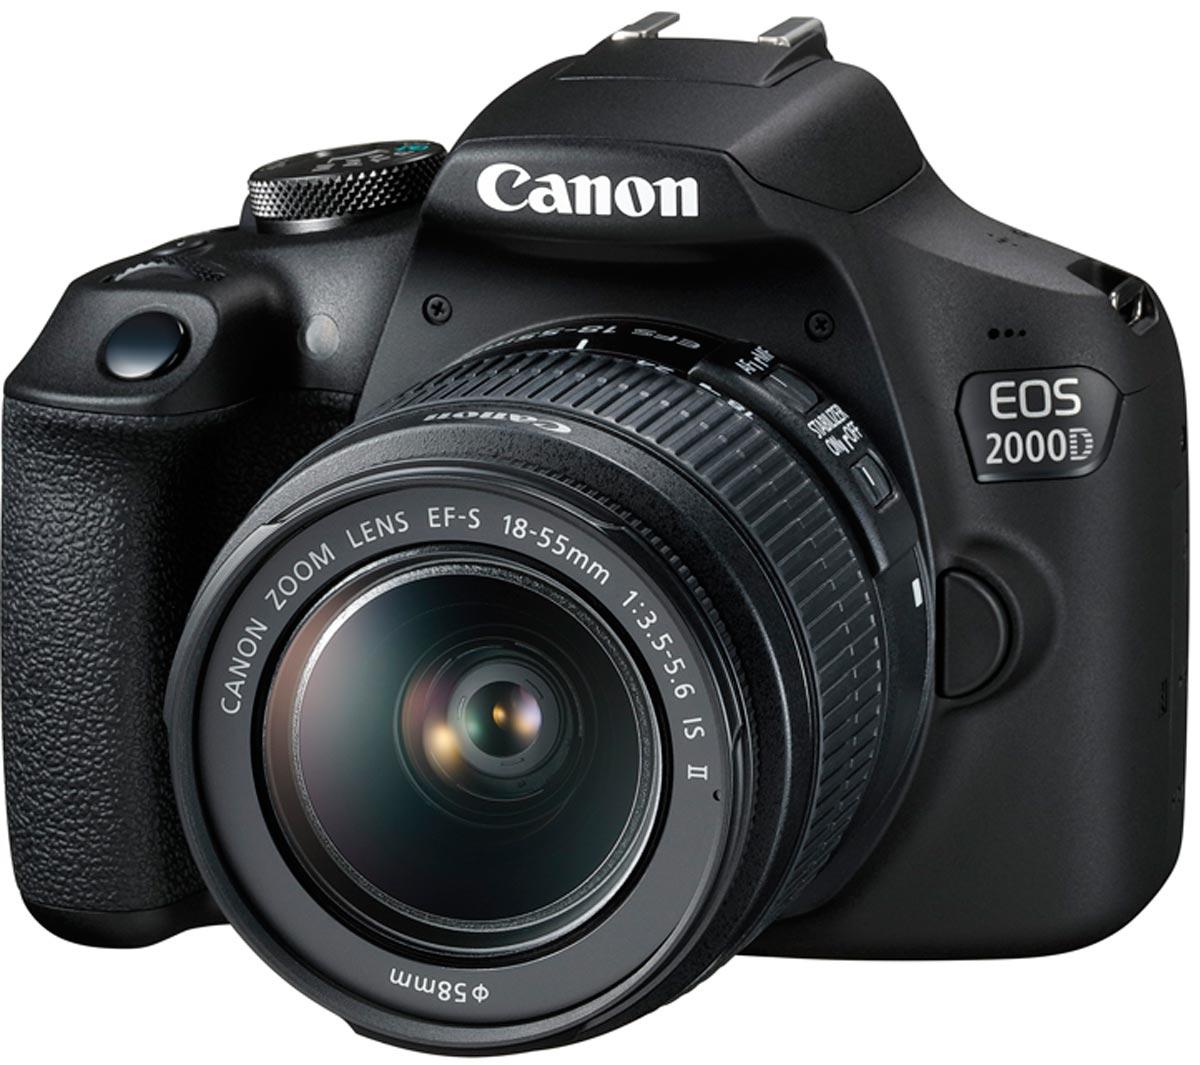 Зеркальный фотоаппарат Canon EOS 2000D Kit, 18-55 IS, Black зеркальный фотоаппарат canon eos 2000d kit black